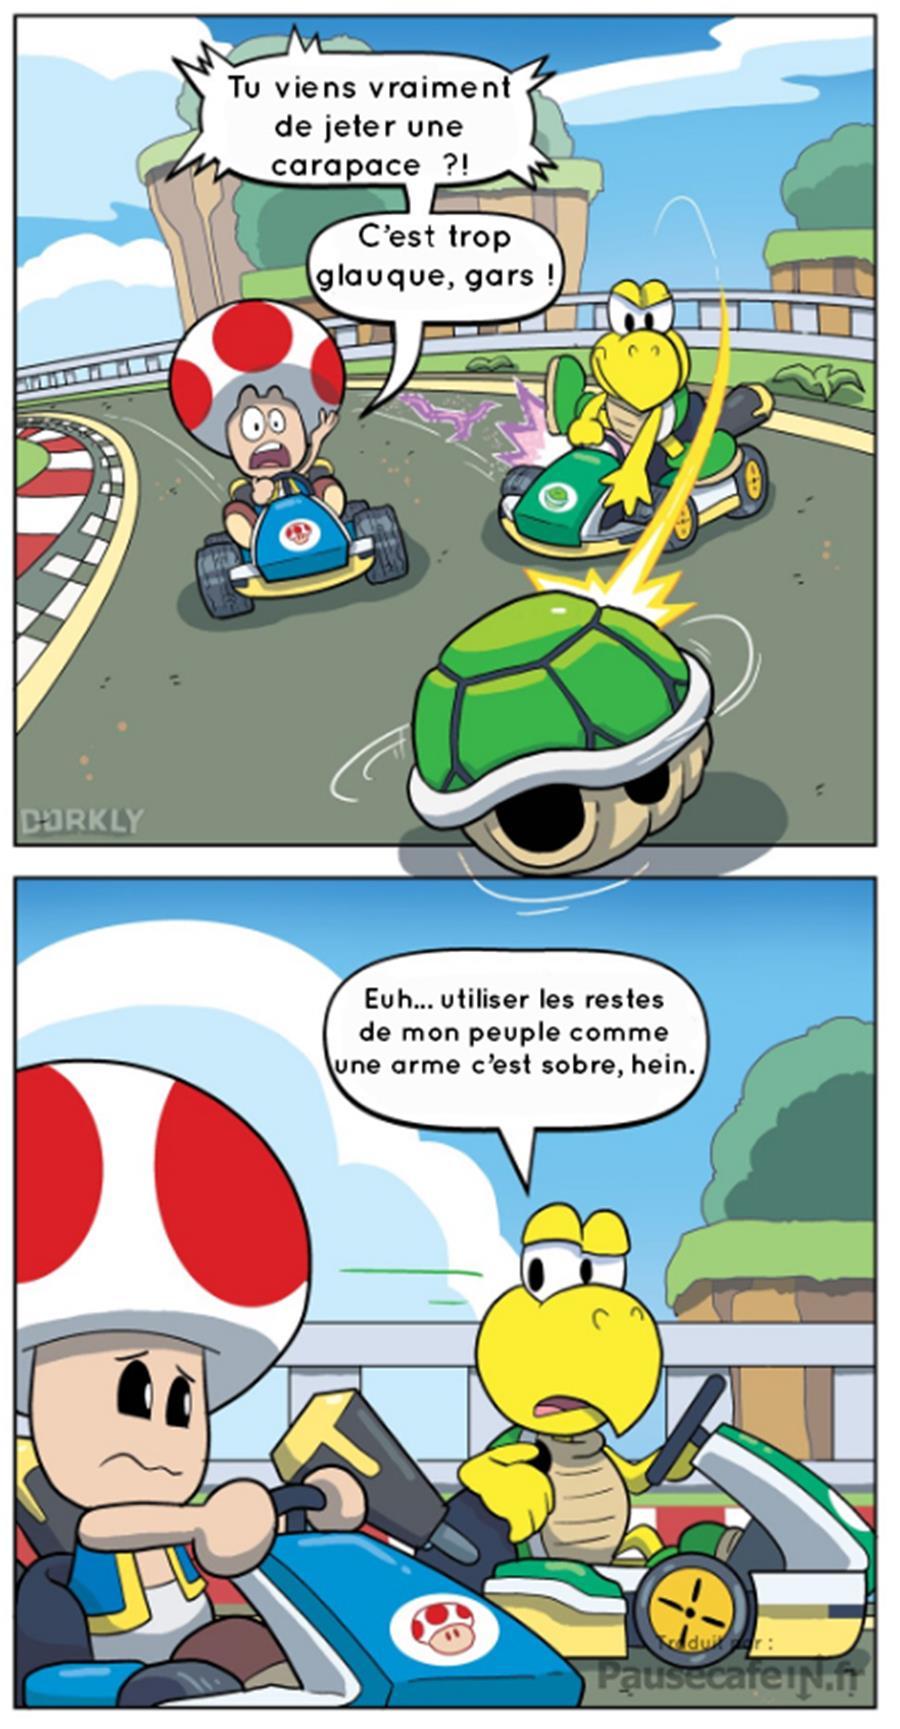 Nintendo licence Mario Kart vérités atroces révélées Koopa carapace verte Toad